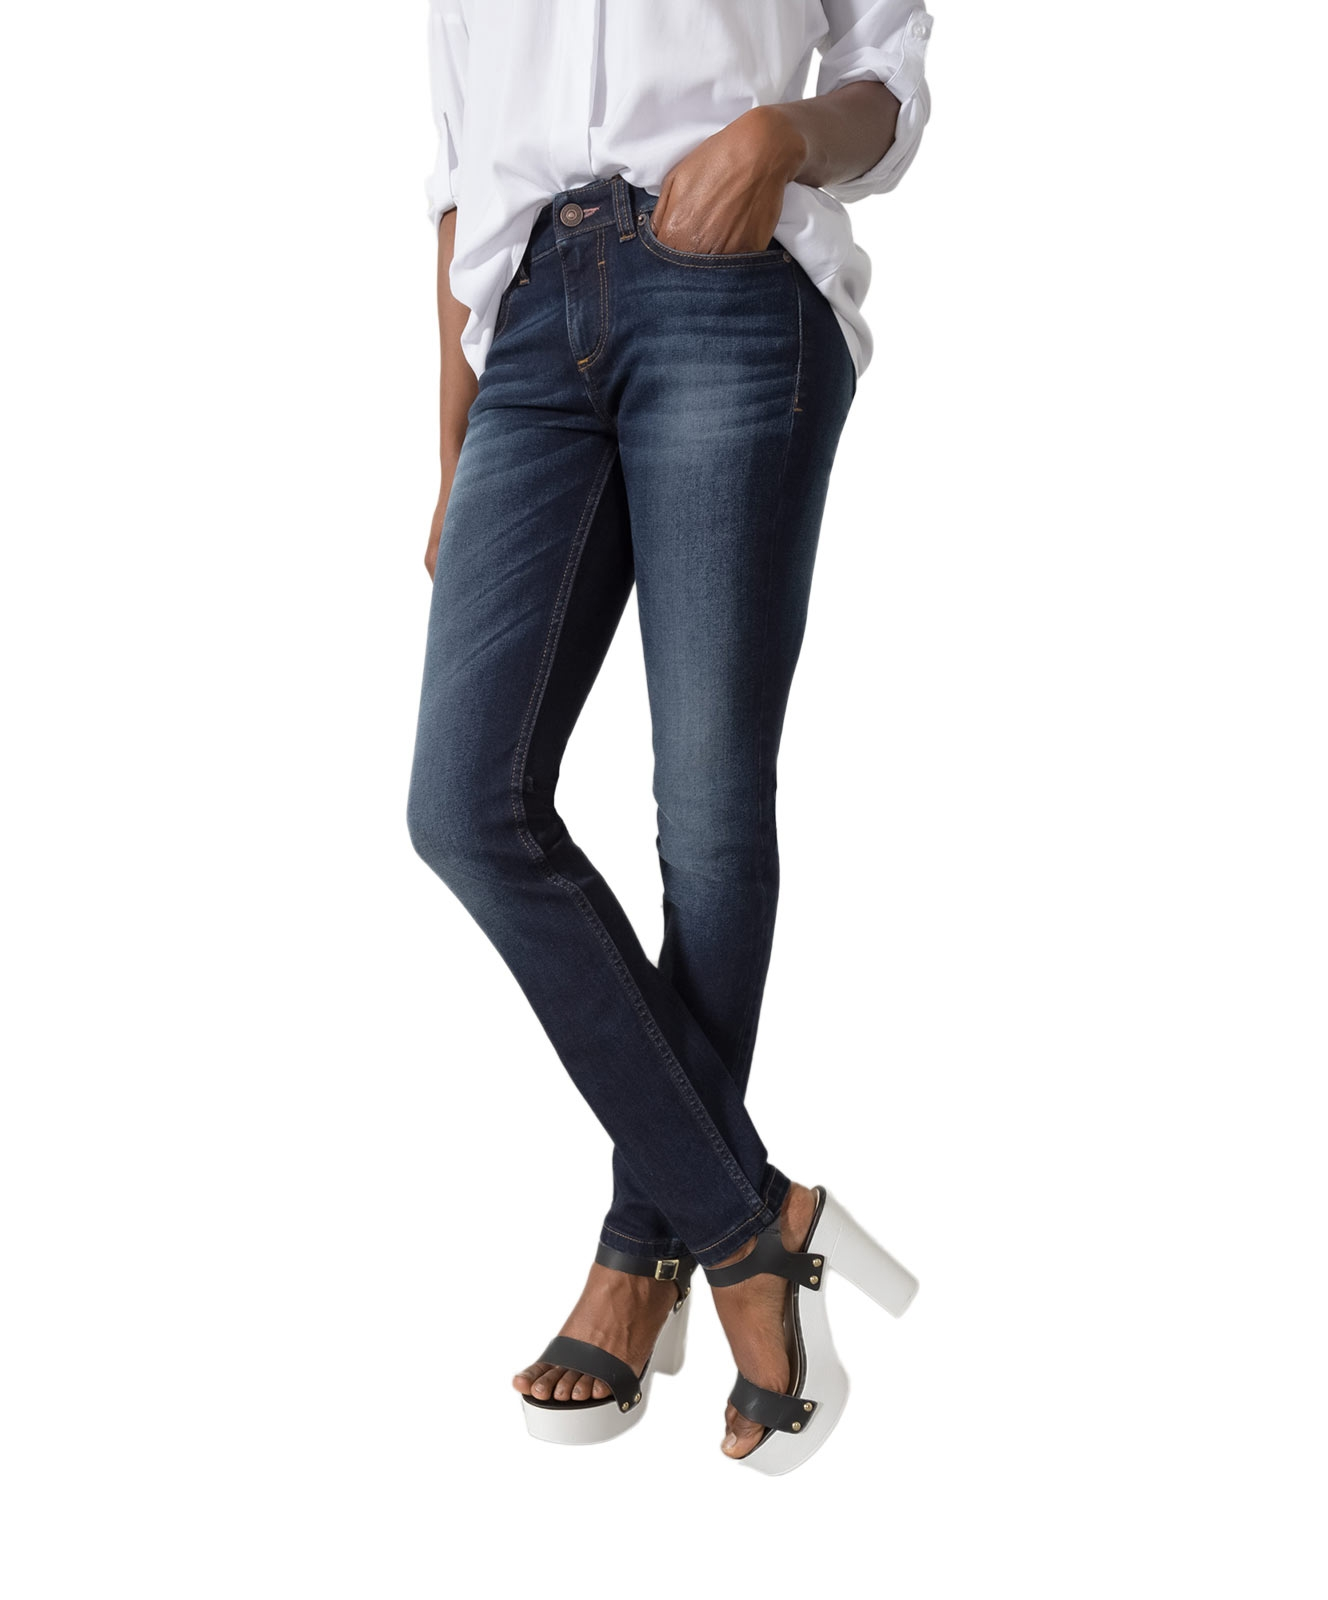 Hosen für Frauen - HIS MONROE Jeans Skinny Fit Advanced Dark Blue  - Onlineshop Jeans Meile